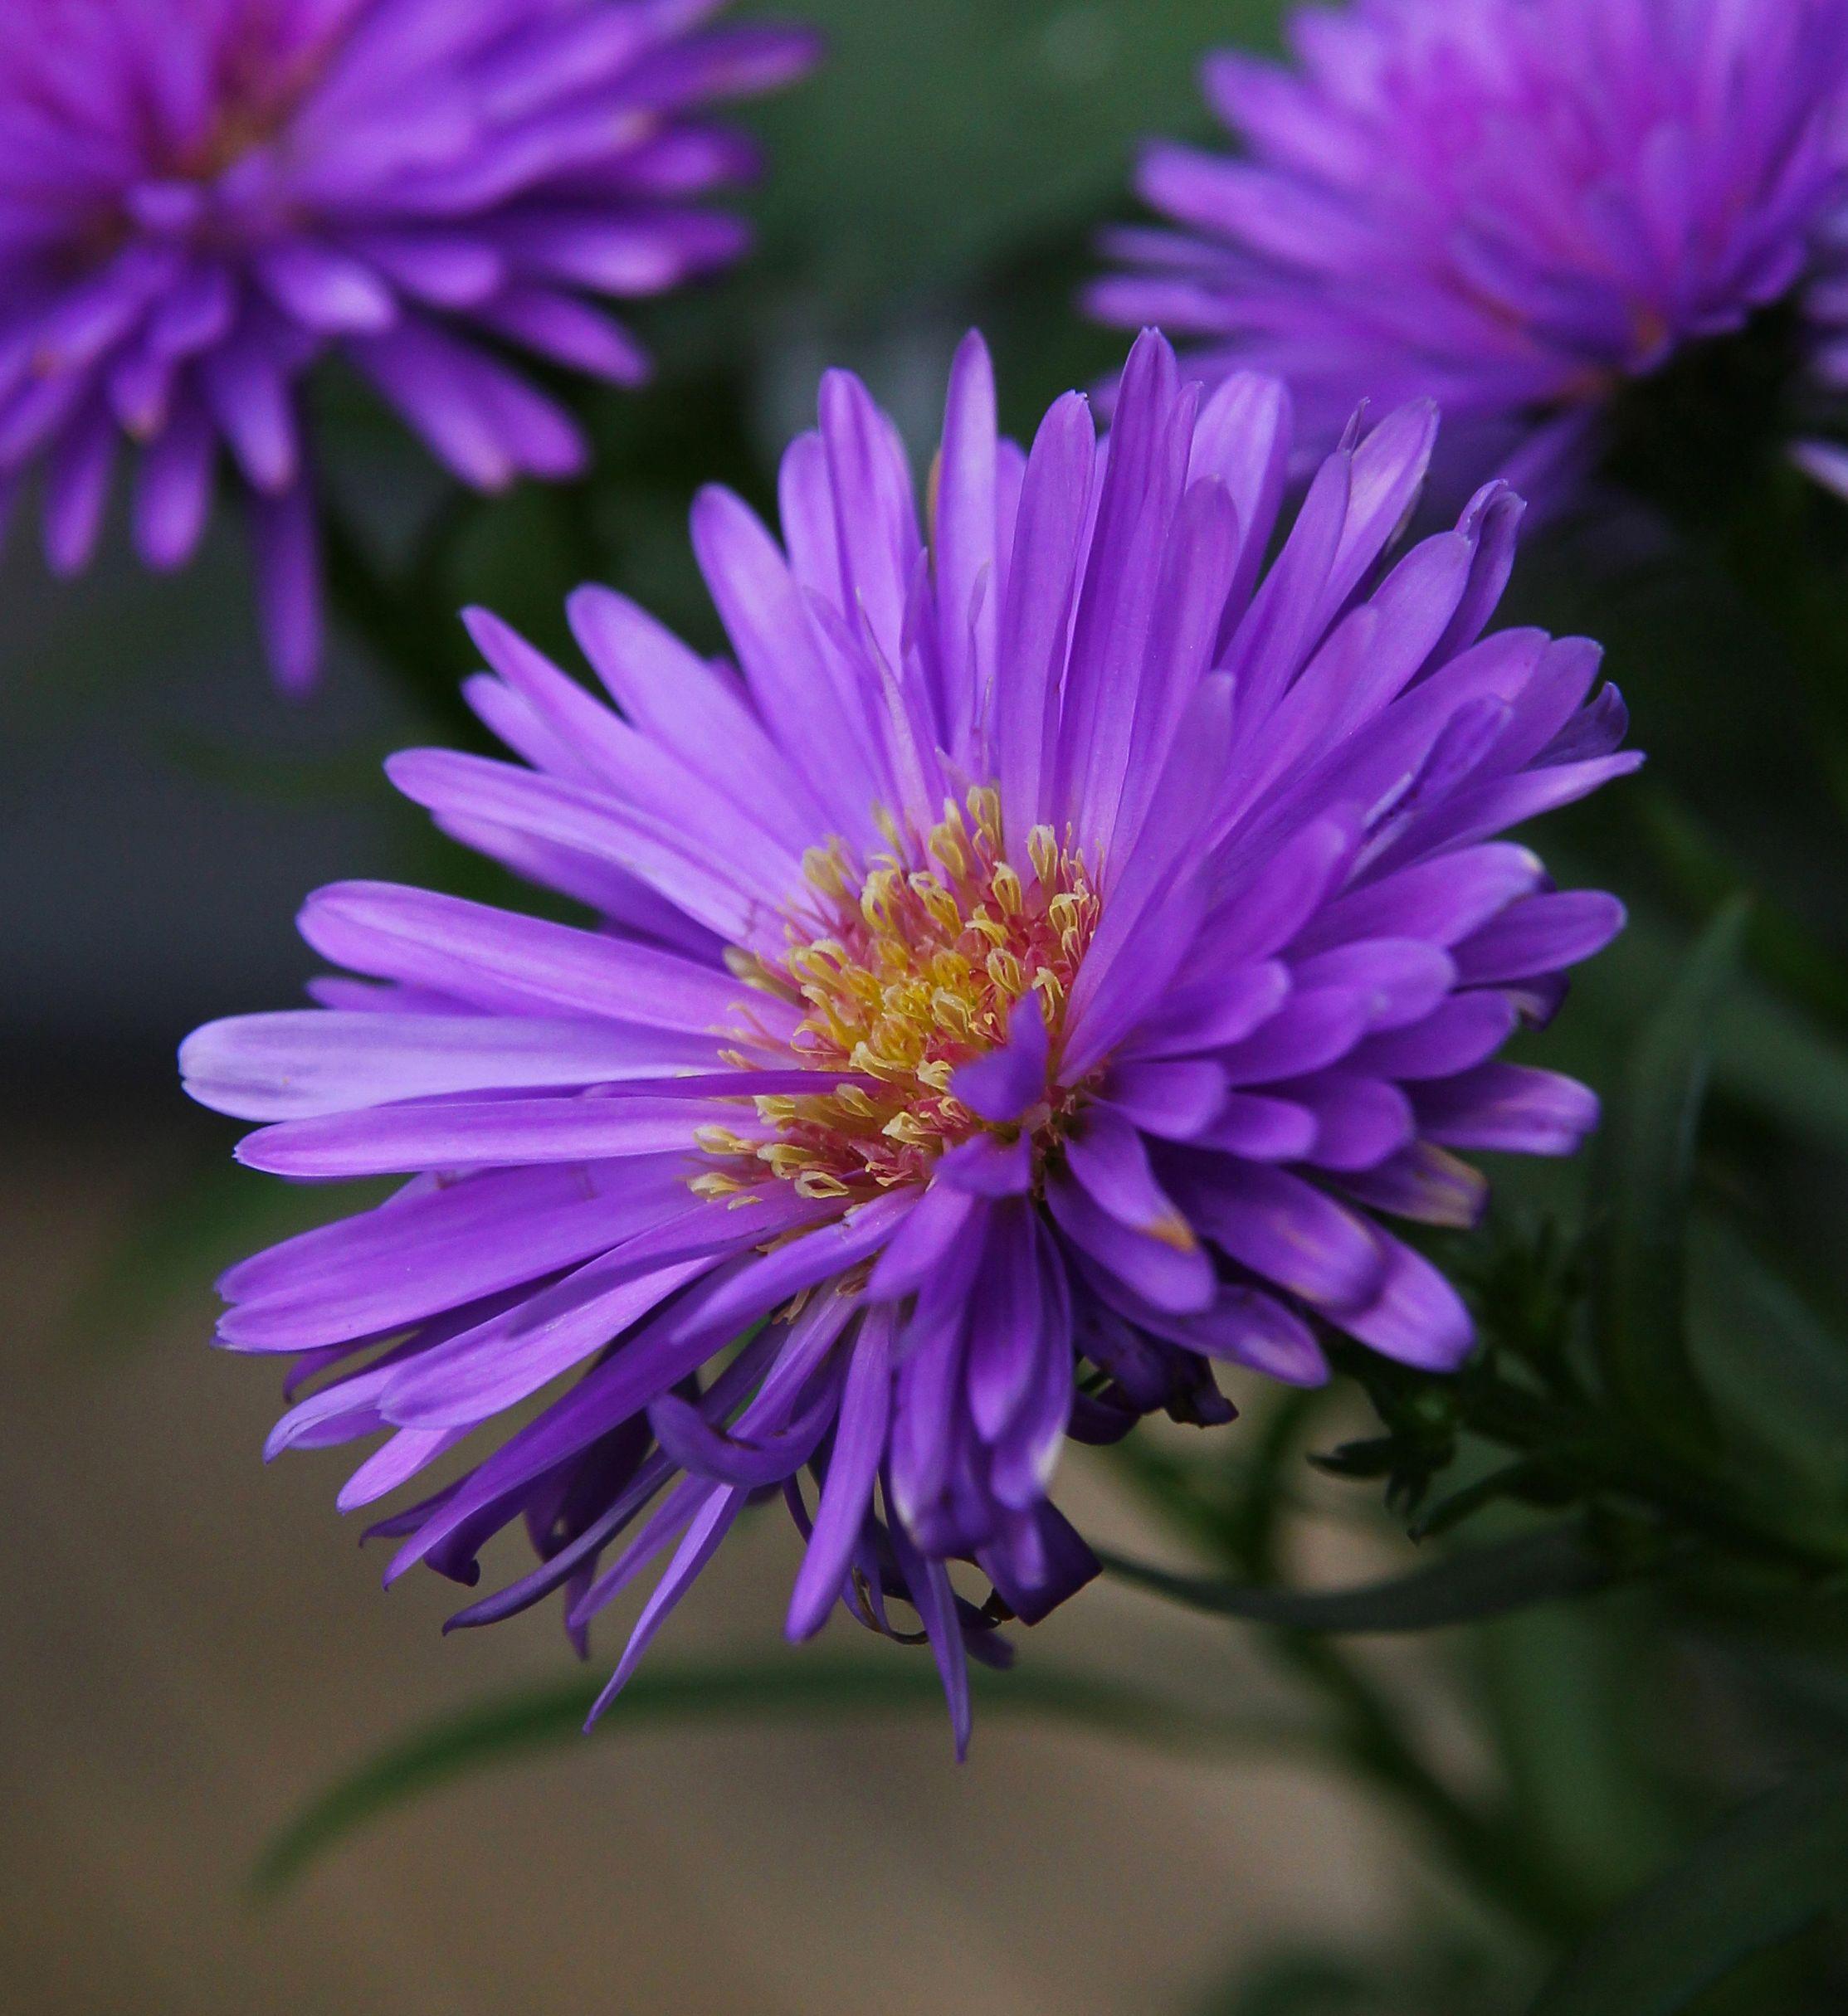 Purple Aster flowers Aster flower, Aster flower tattoos